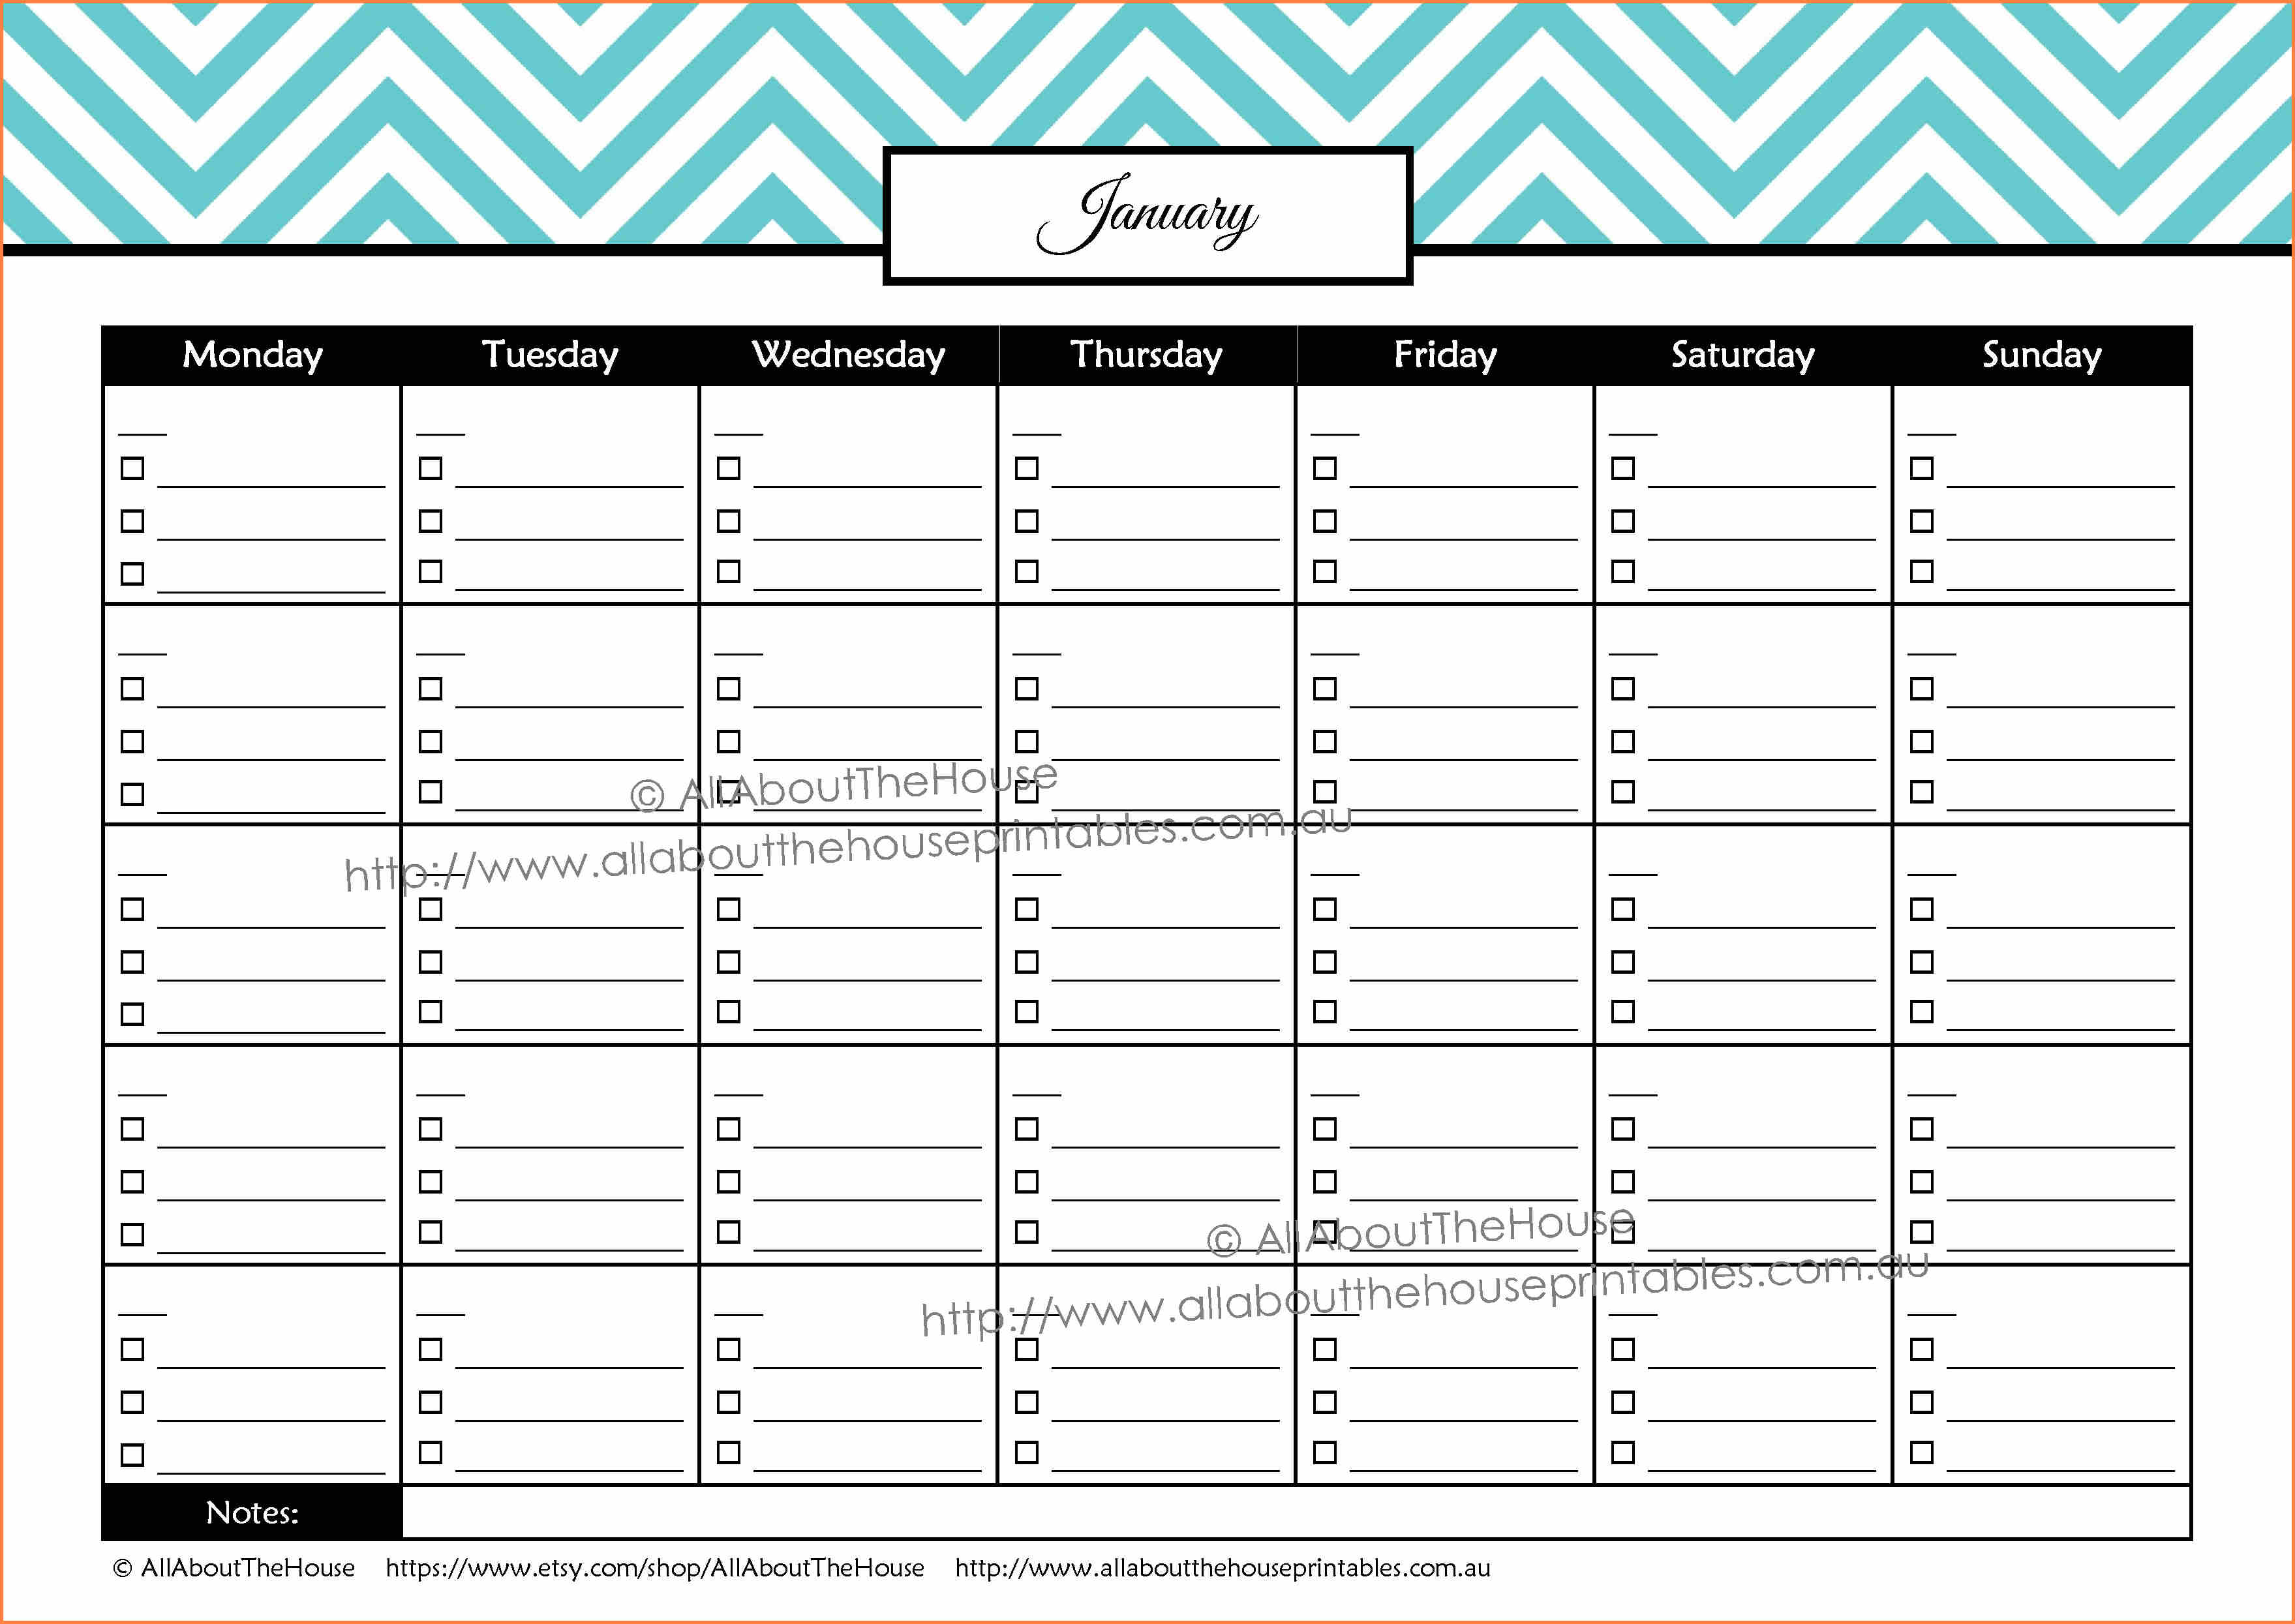 009 Bill Pay Calendar Template Ideas Paying Free Printable 2016 in Bill Payment Calendar Template Printable